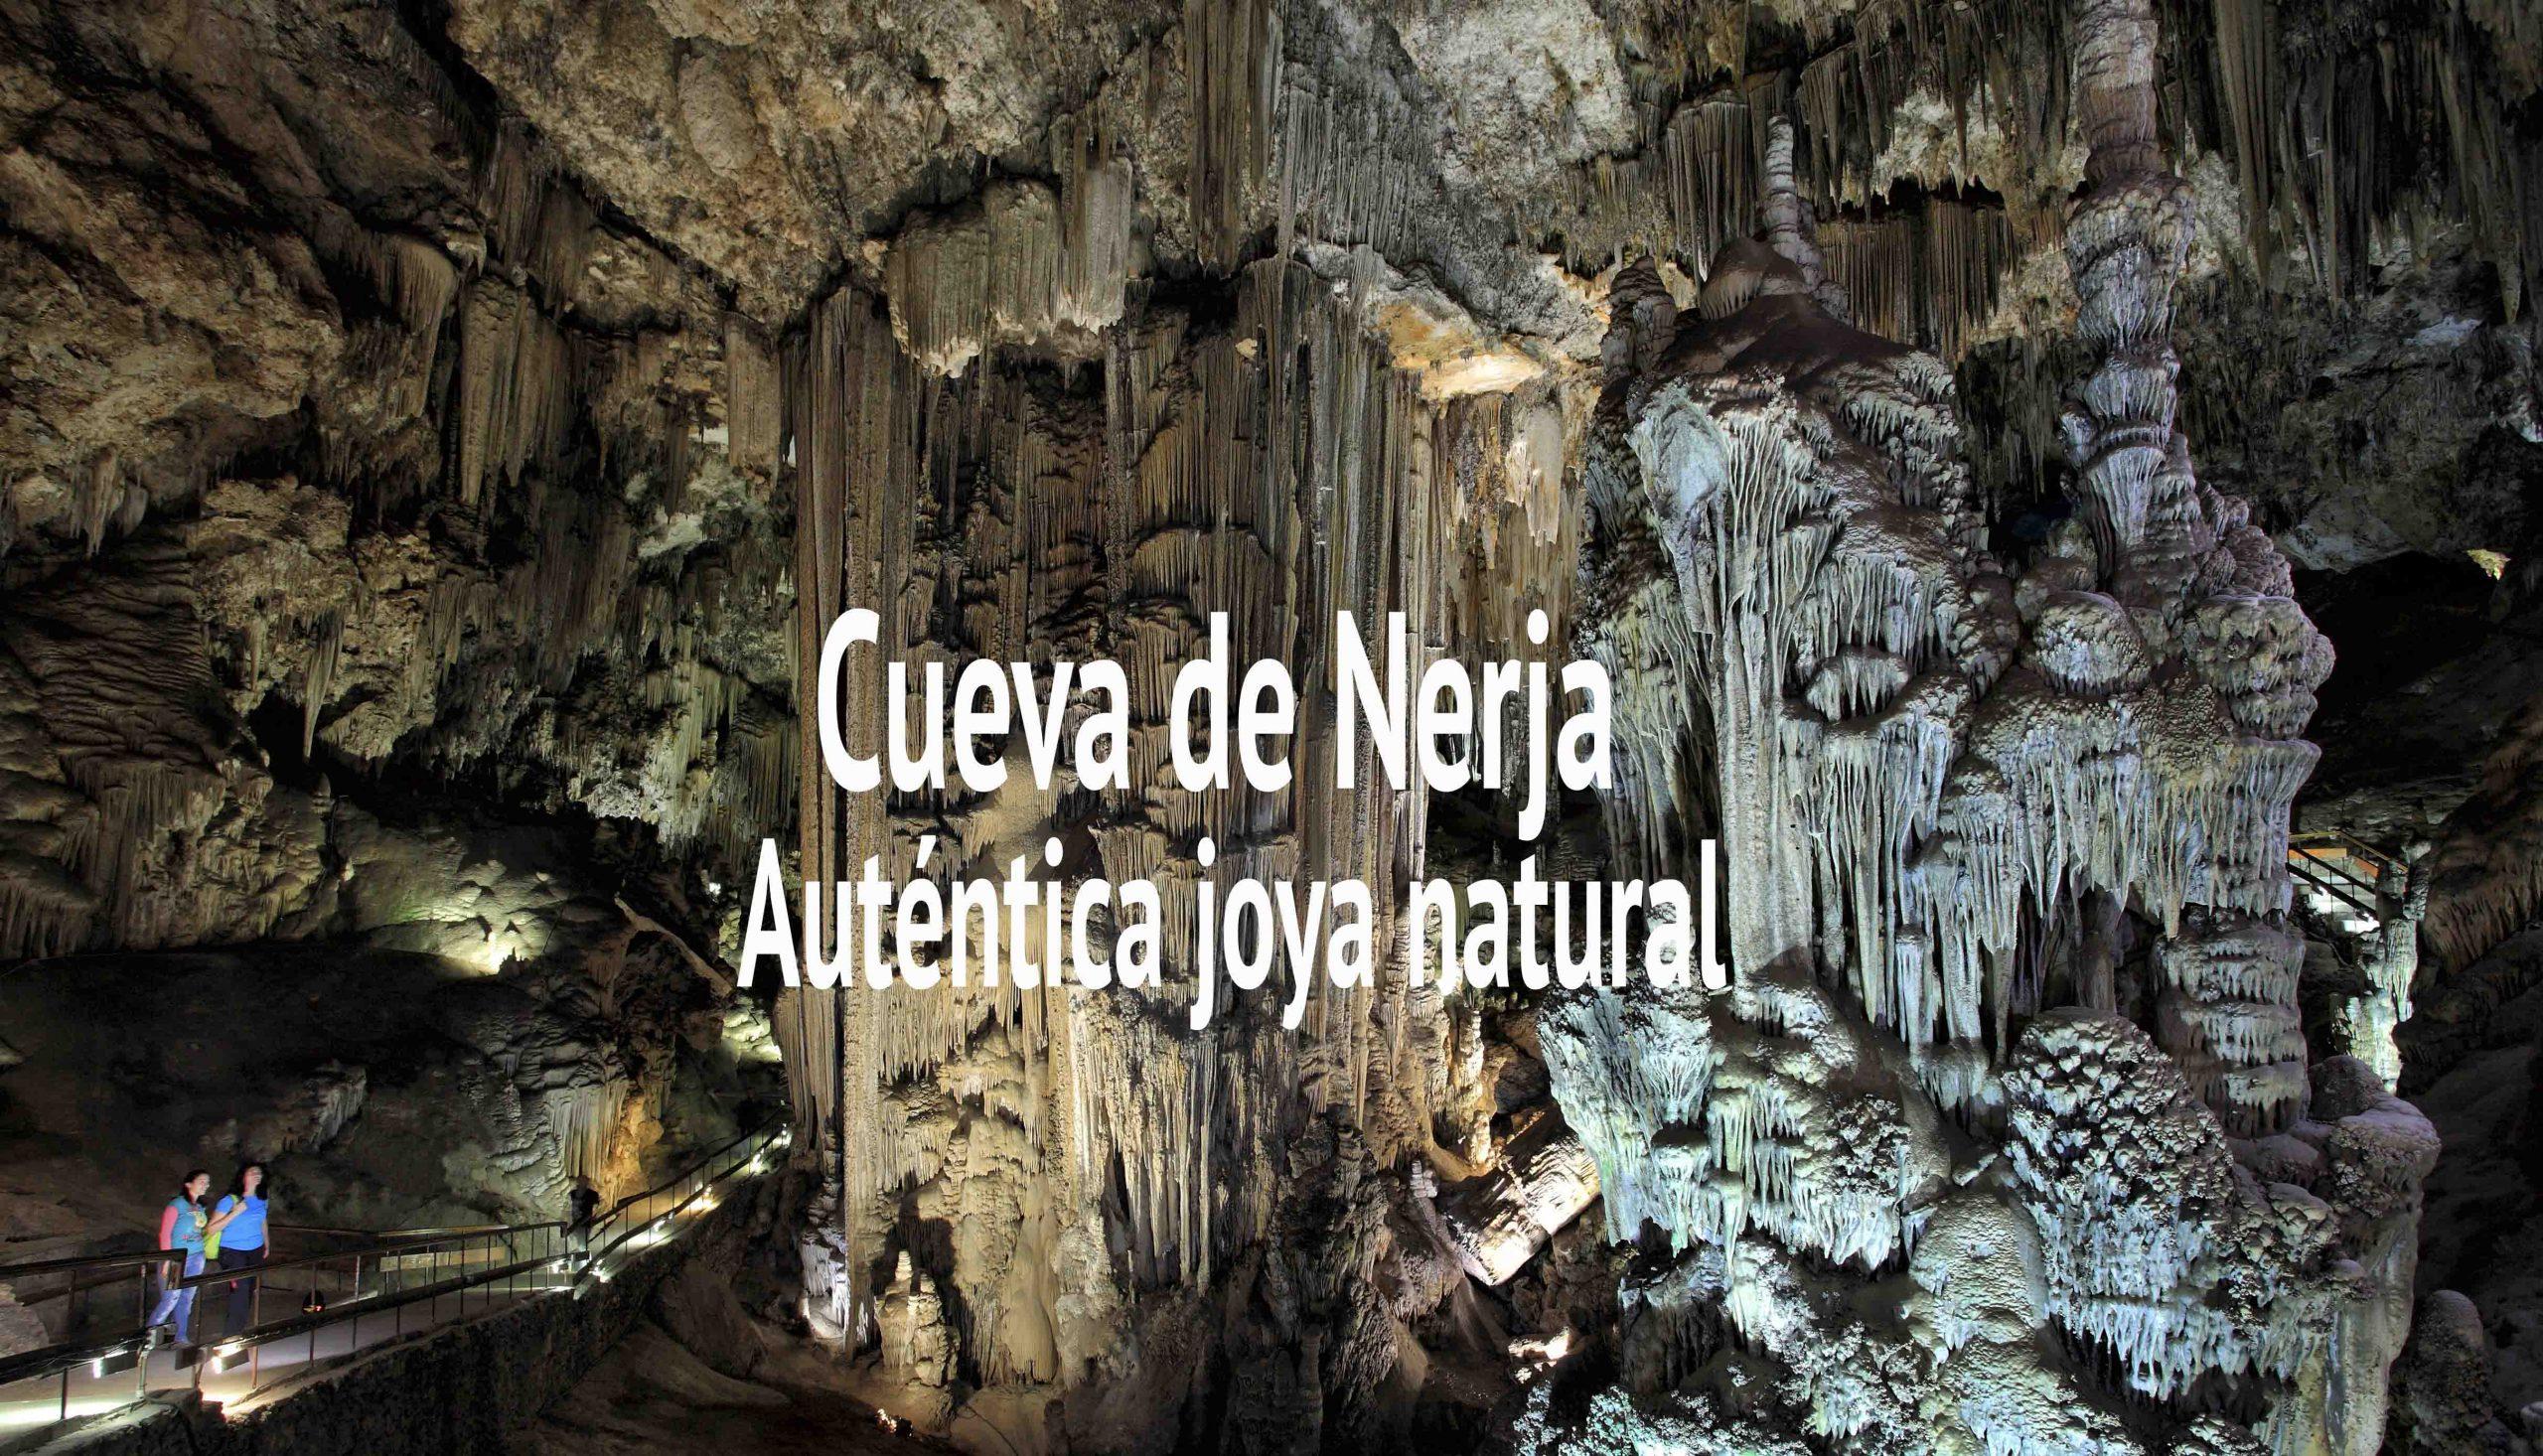 Cueva de Nerja. Joya Naturaleza